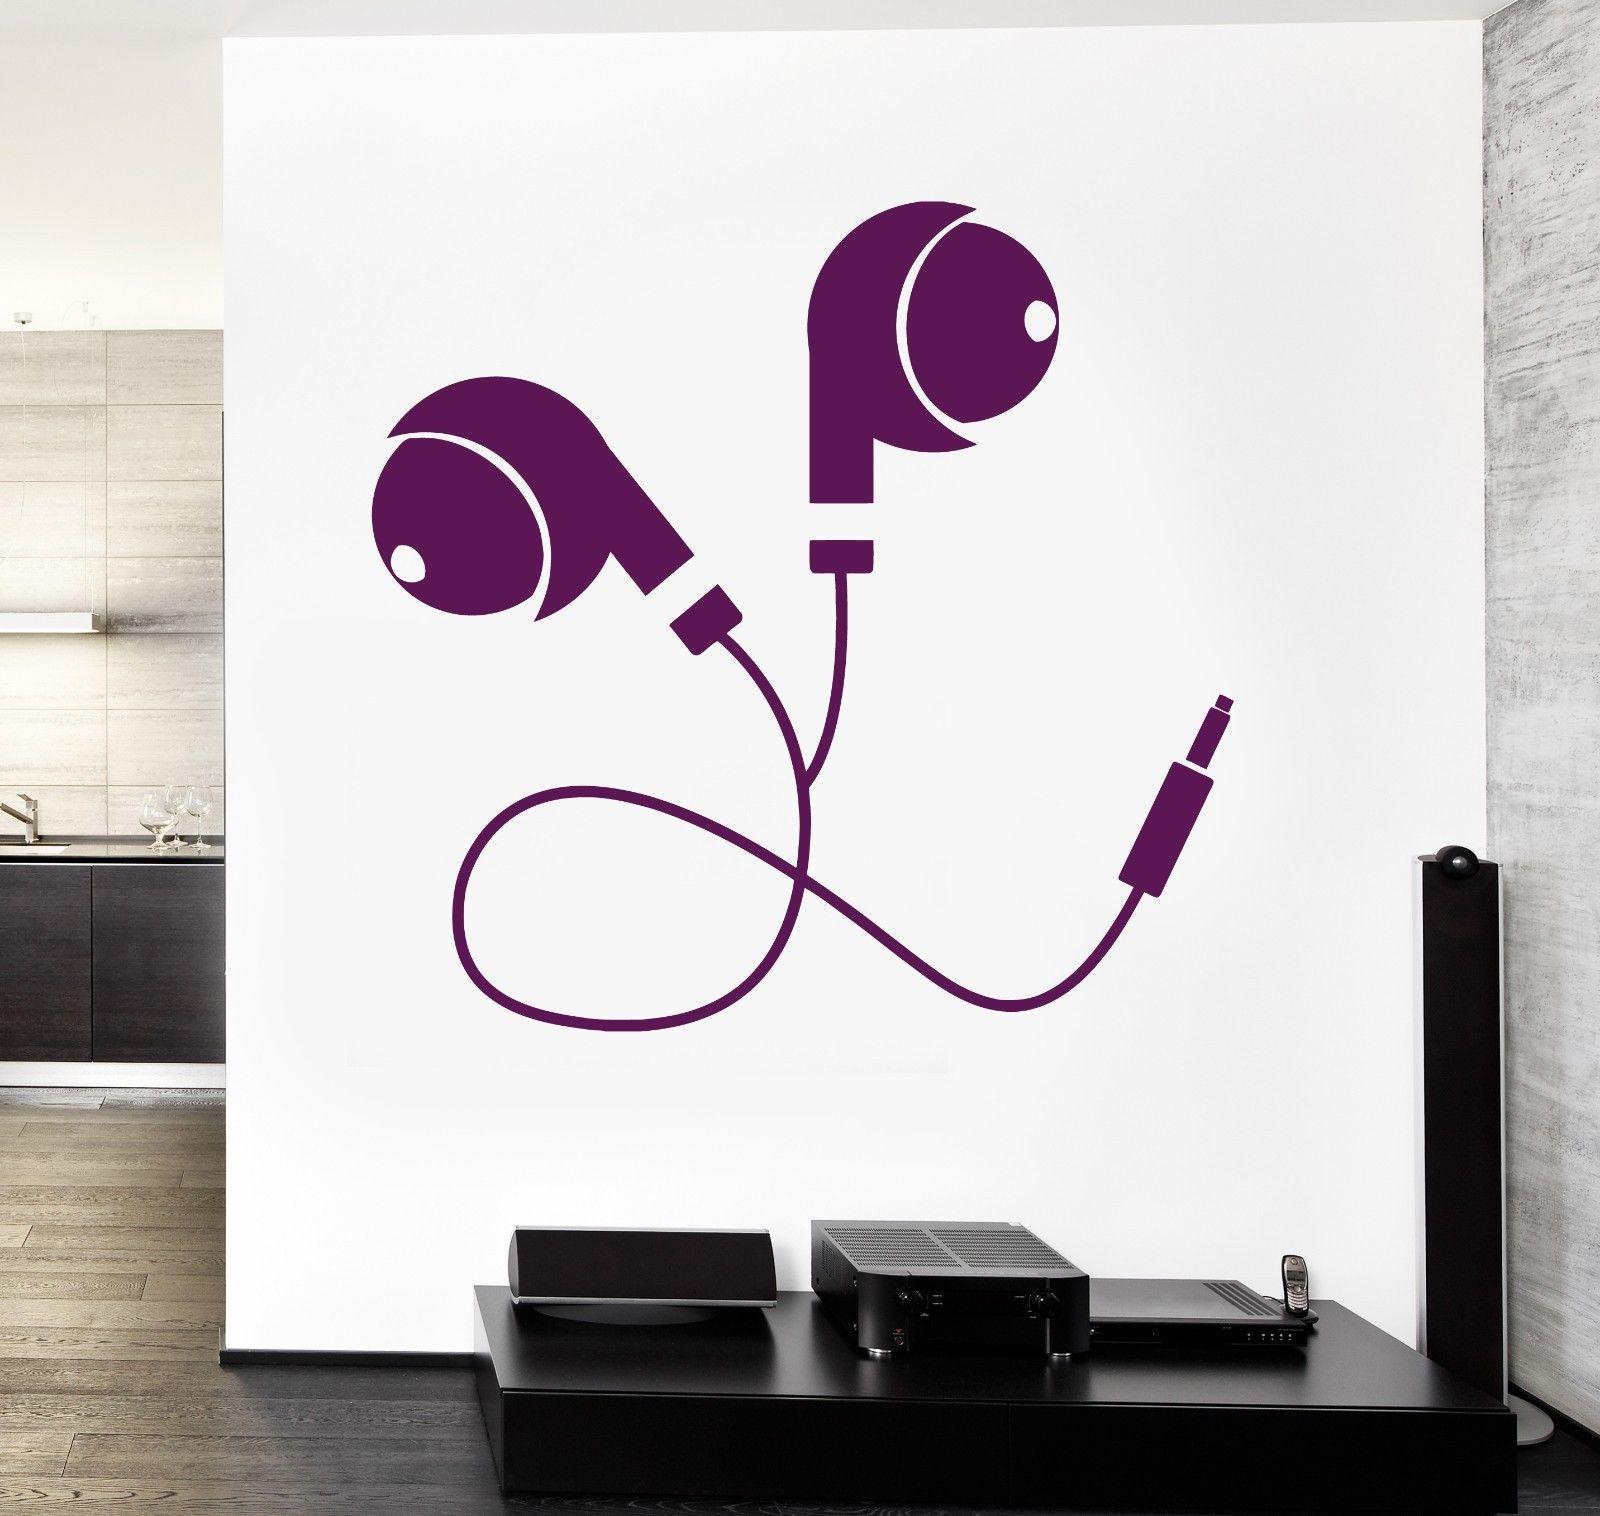 Wall Vinyl Music Earphone Head Phones Headphones Guaranteed Quality Decal Free shipping(China (Mainland))